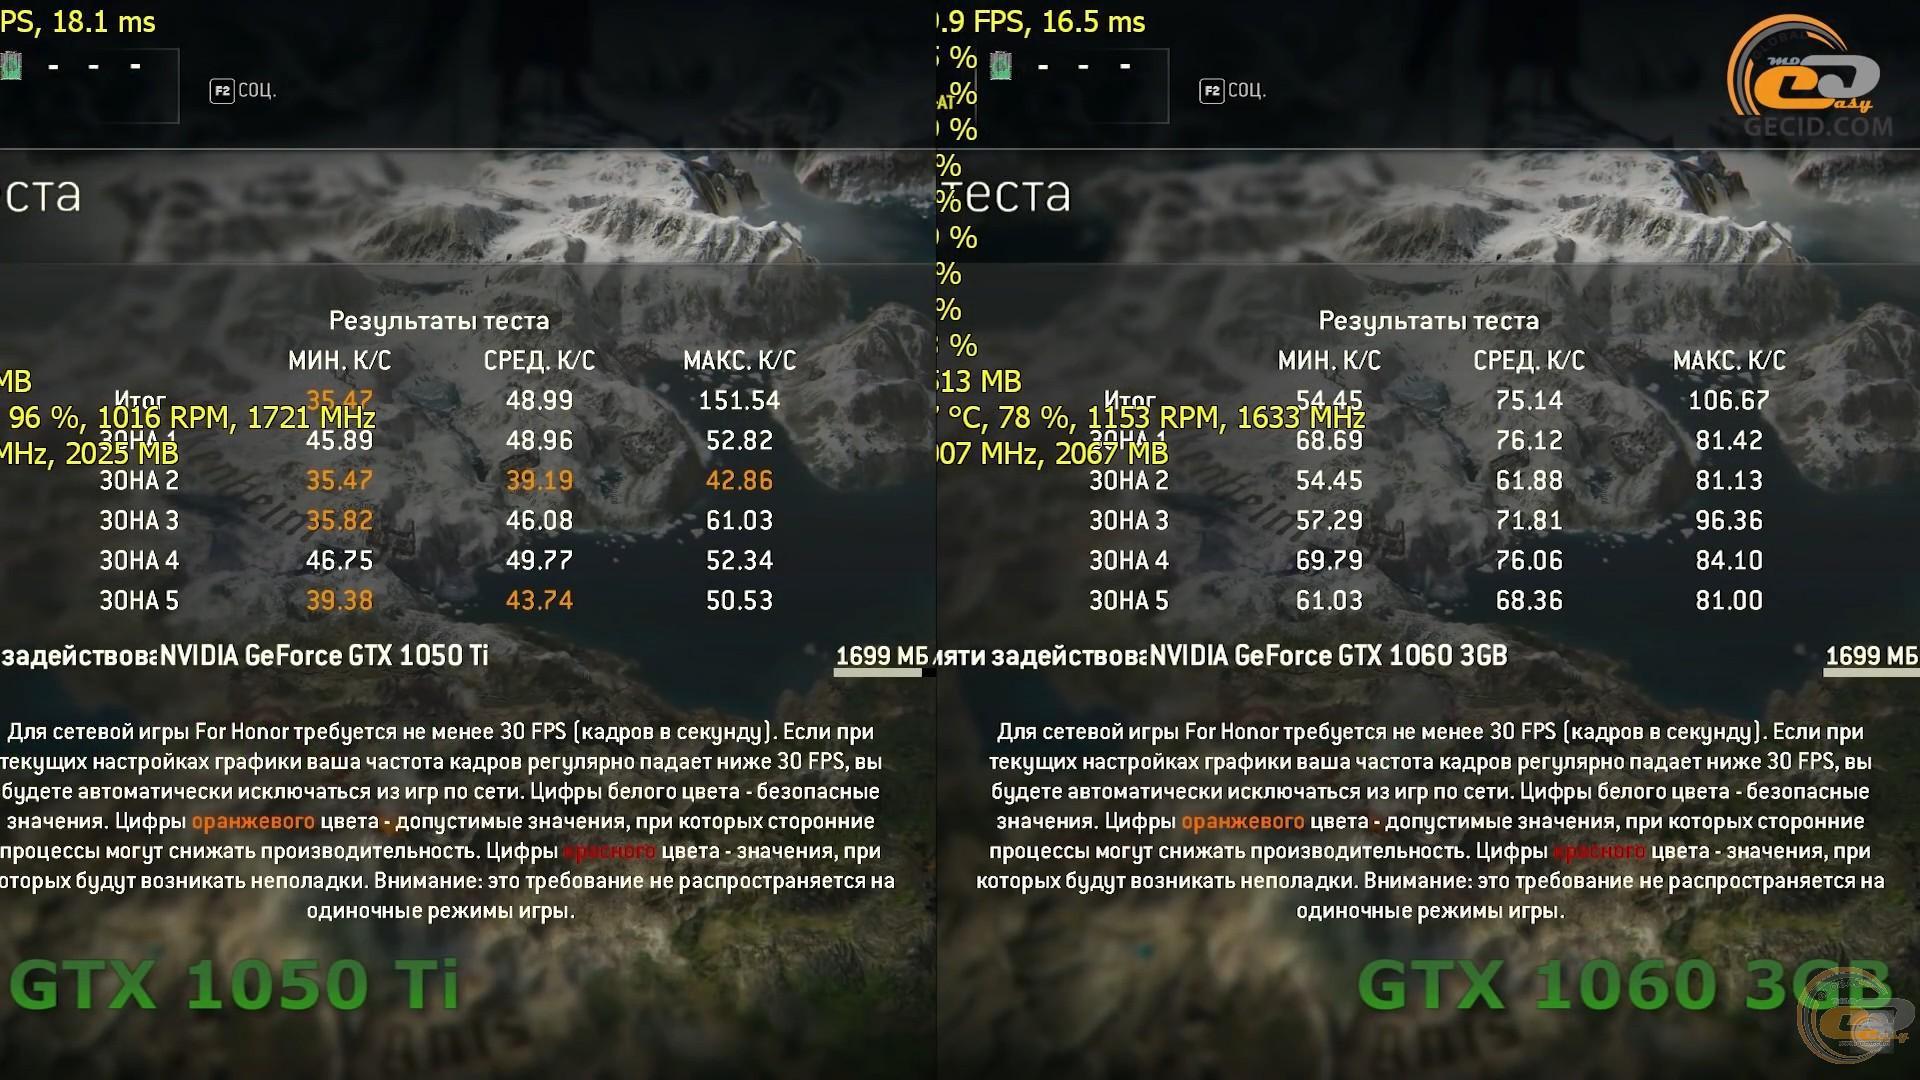 Cравнение NVIDIA GeForce GTX 1050 Ti vs GTX 1060 3GB на